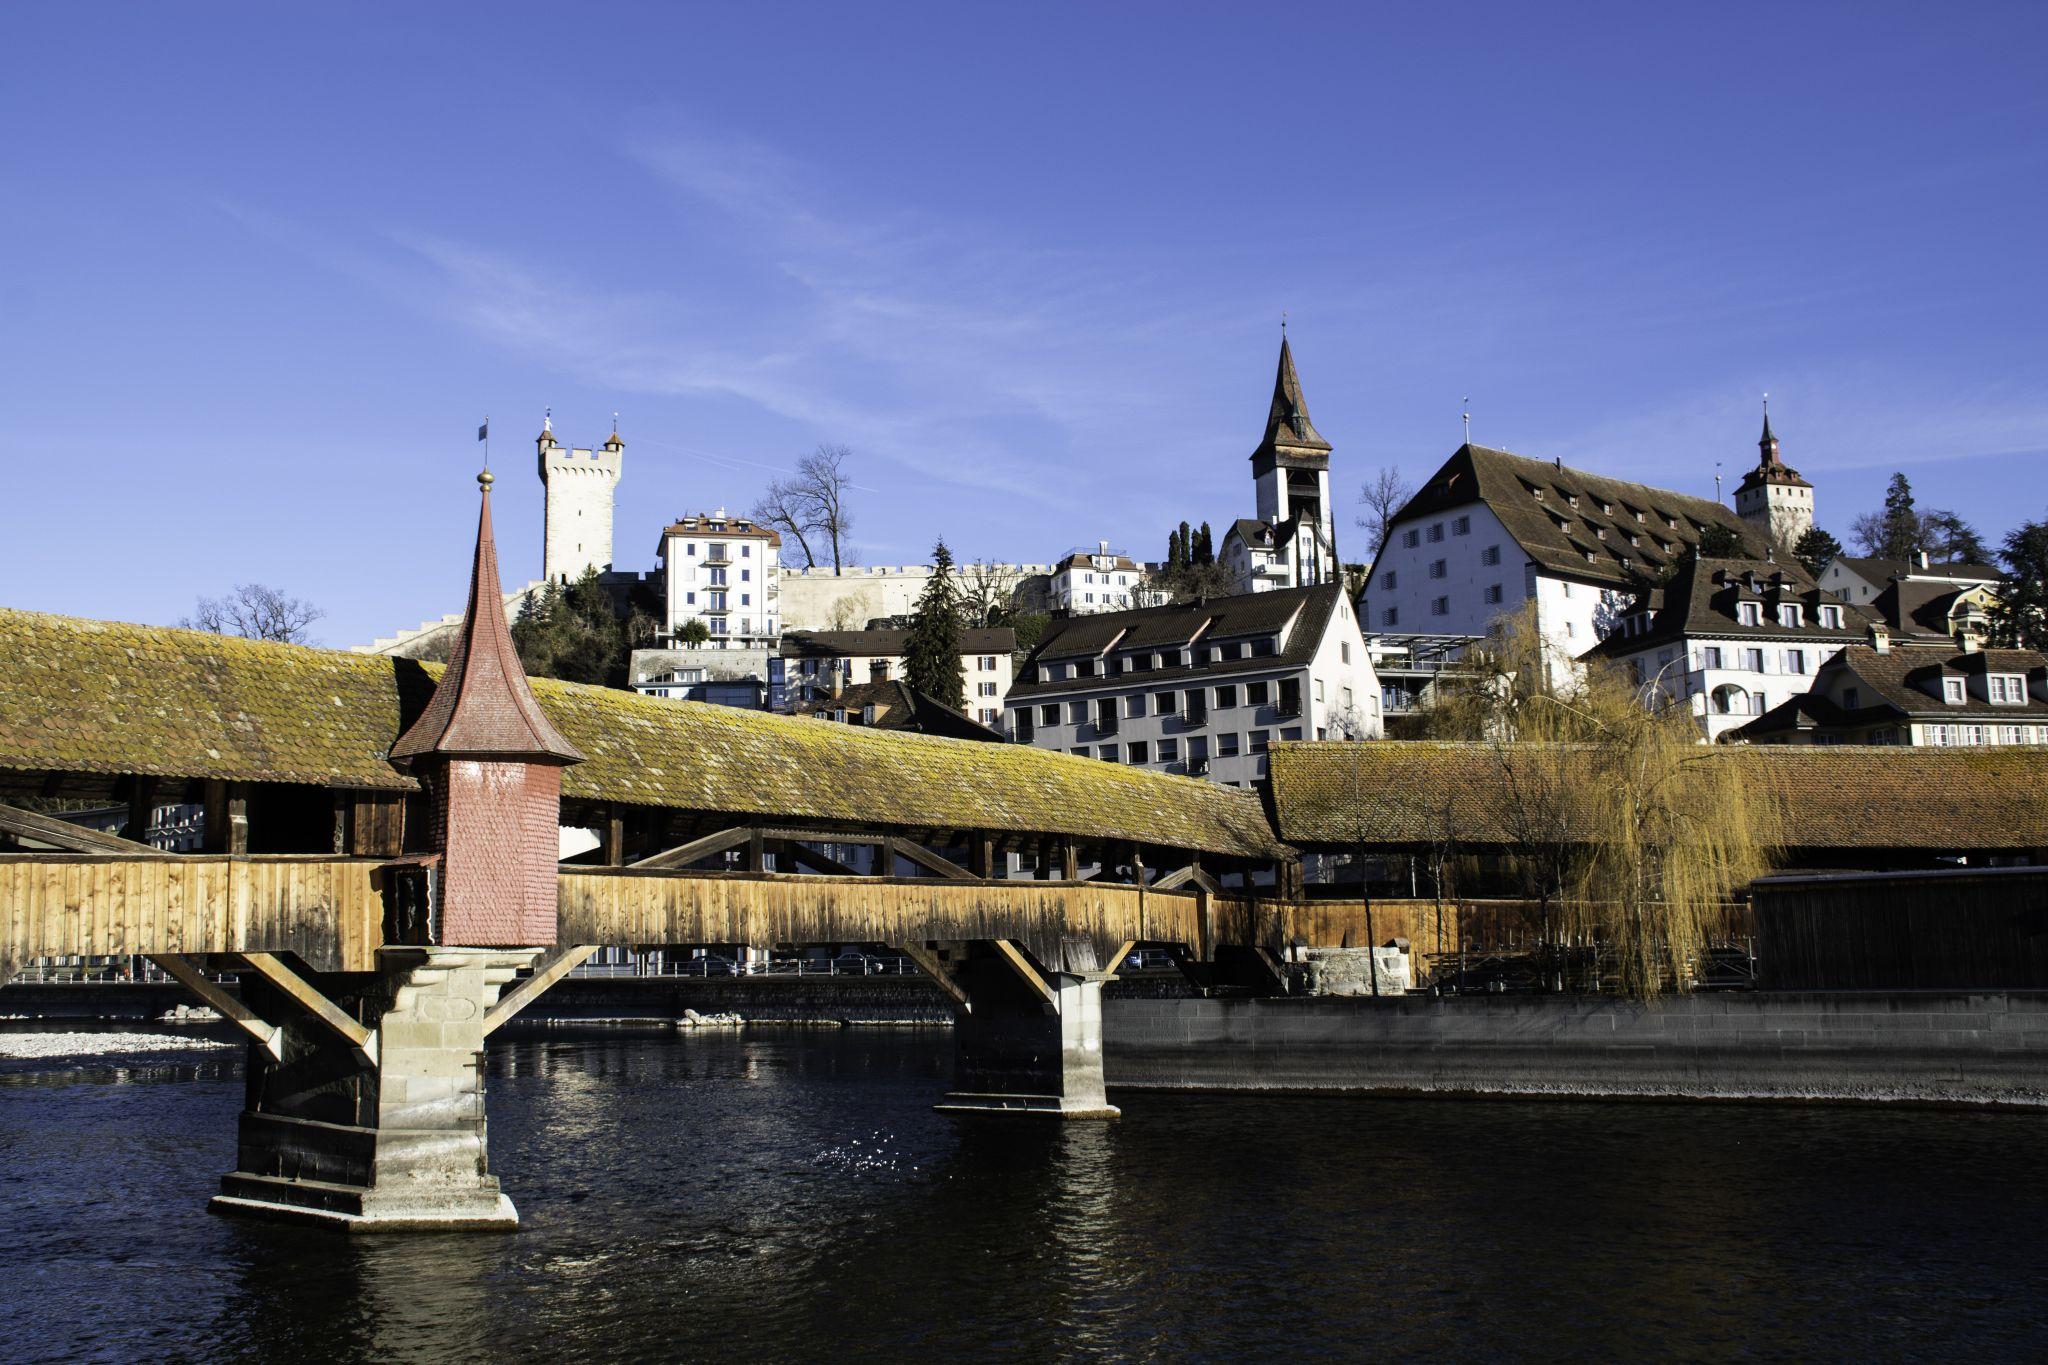 Spreuerbrücke Bridge, Switzerland